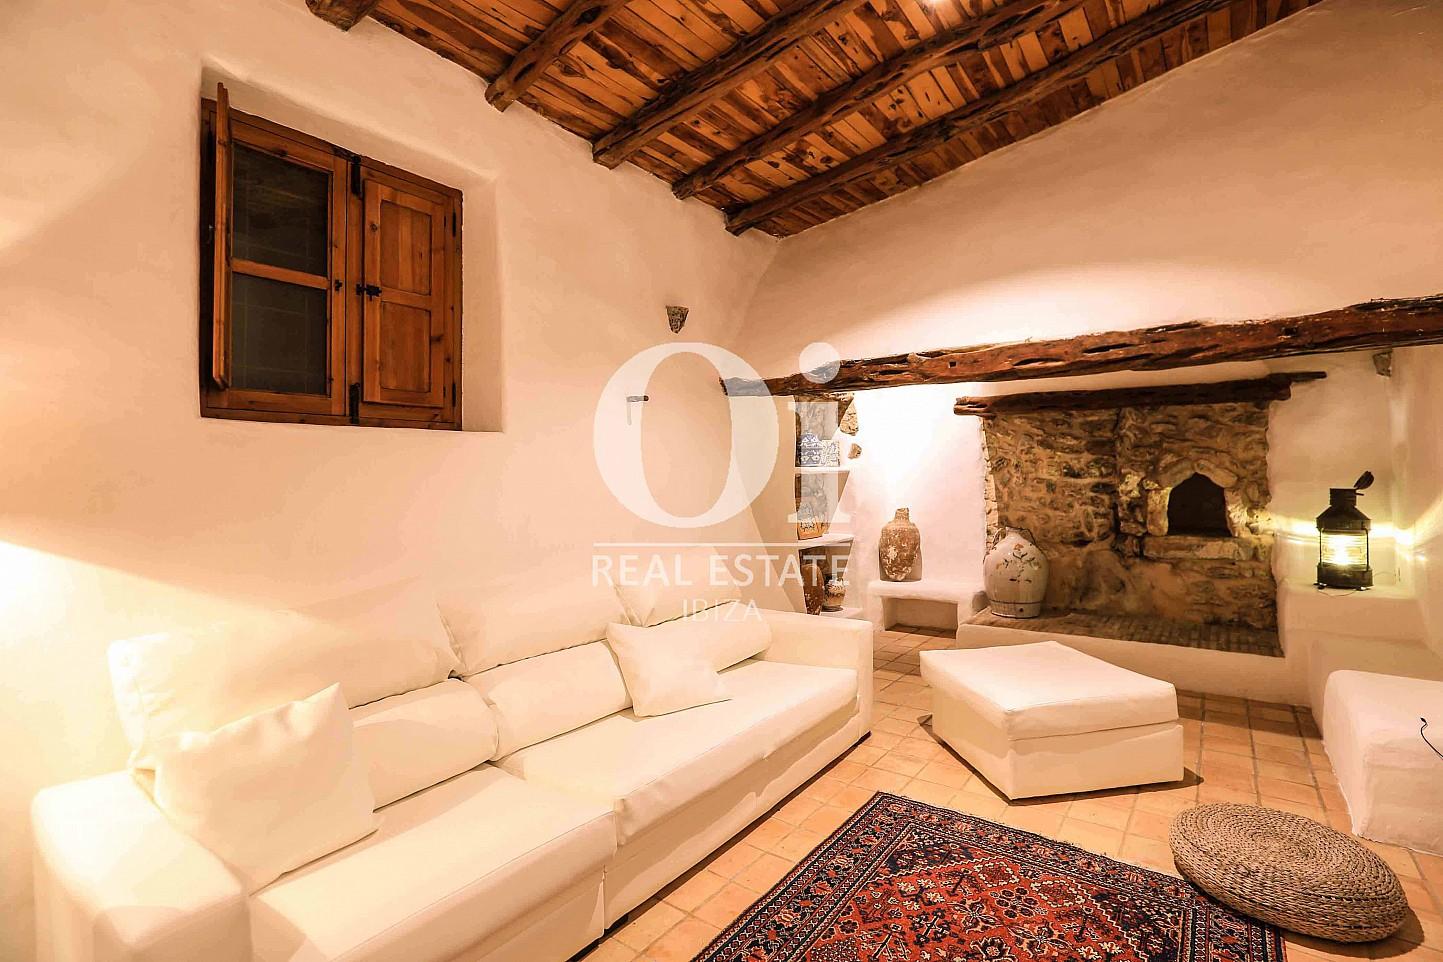 Salón de casa en alquiler vacacional en zona Puig d'en Valls, Ibiza